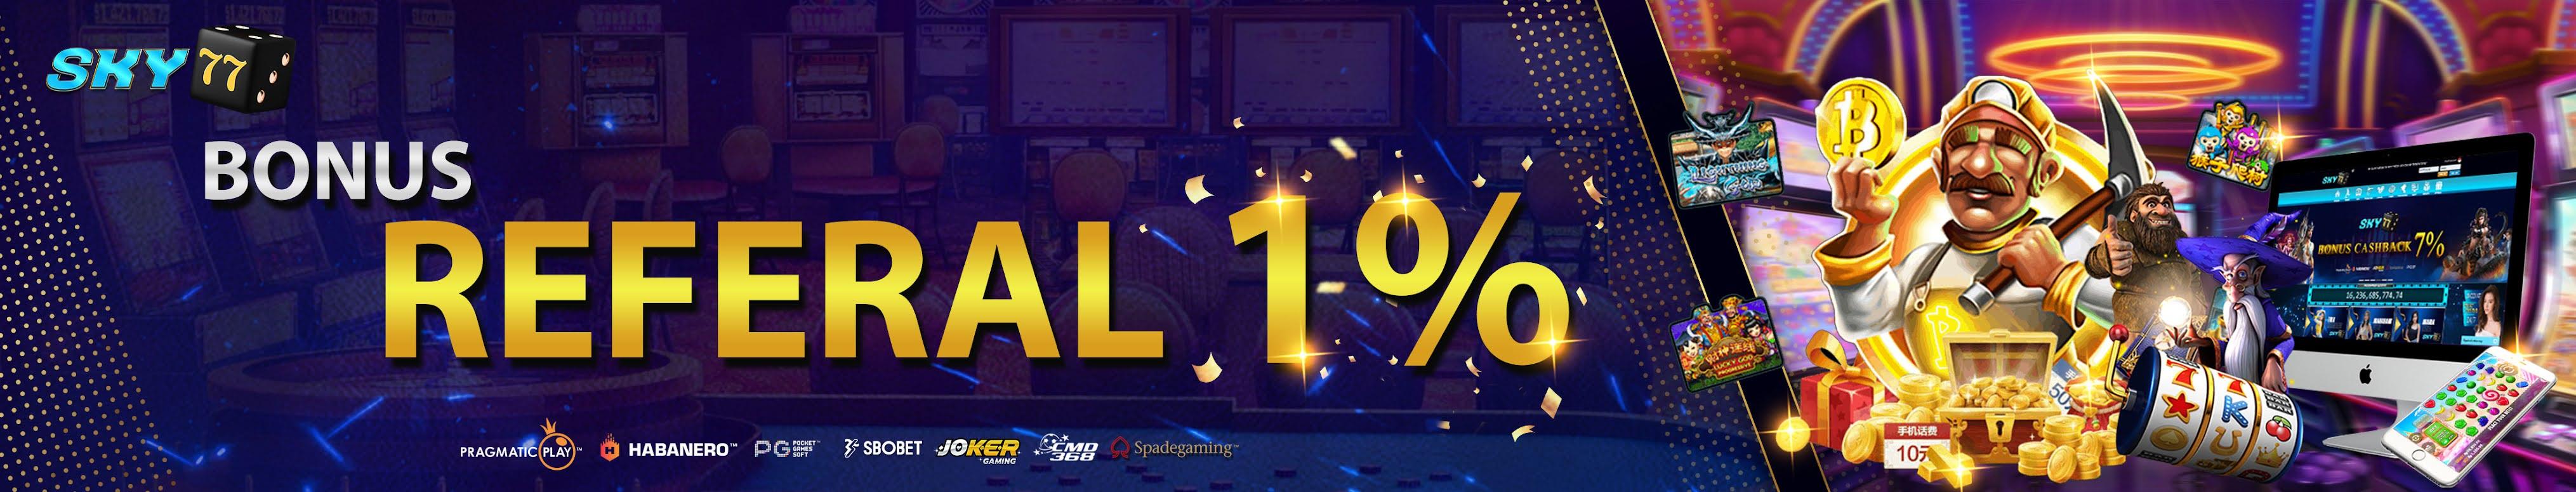 bonus refferal 1%